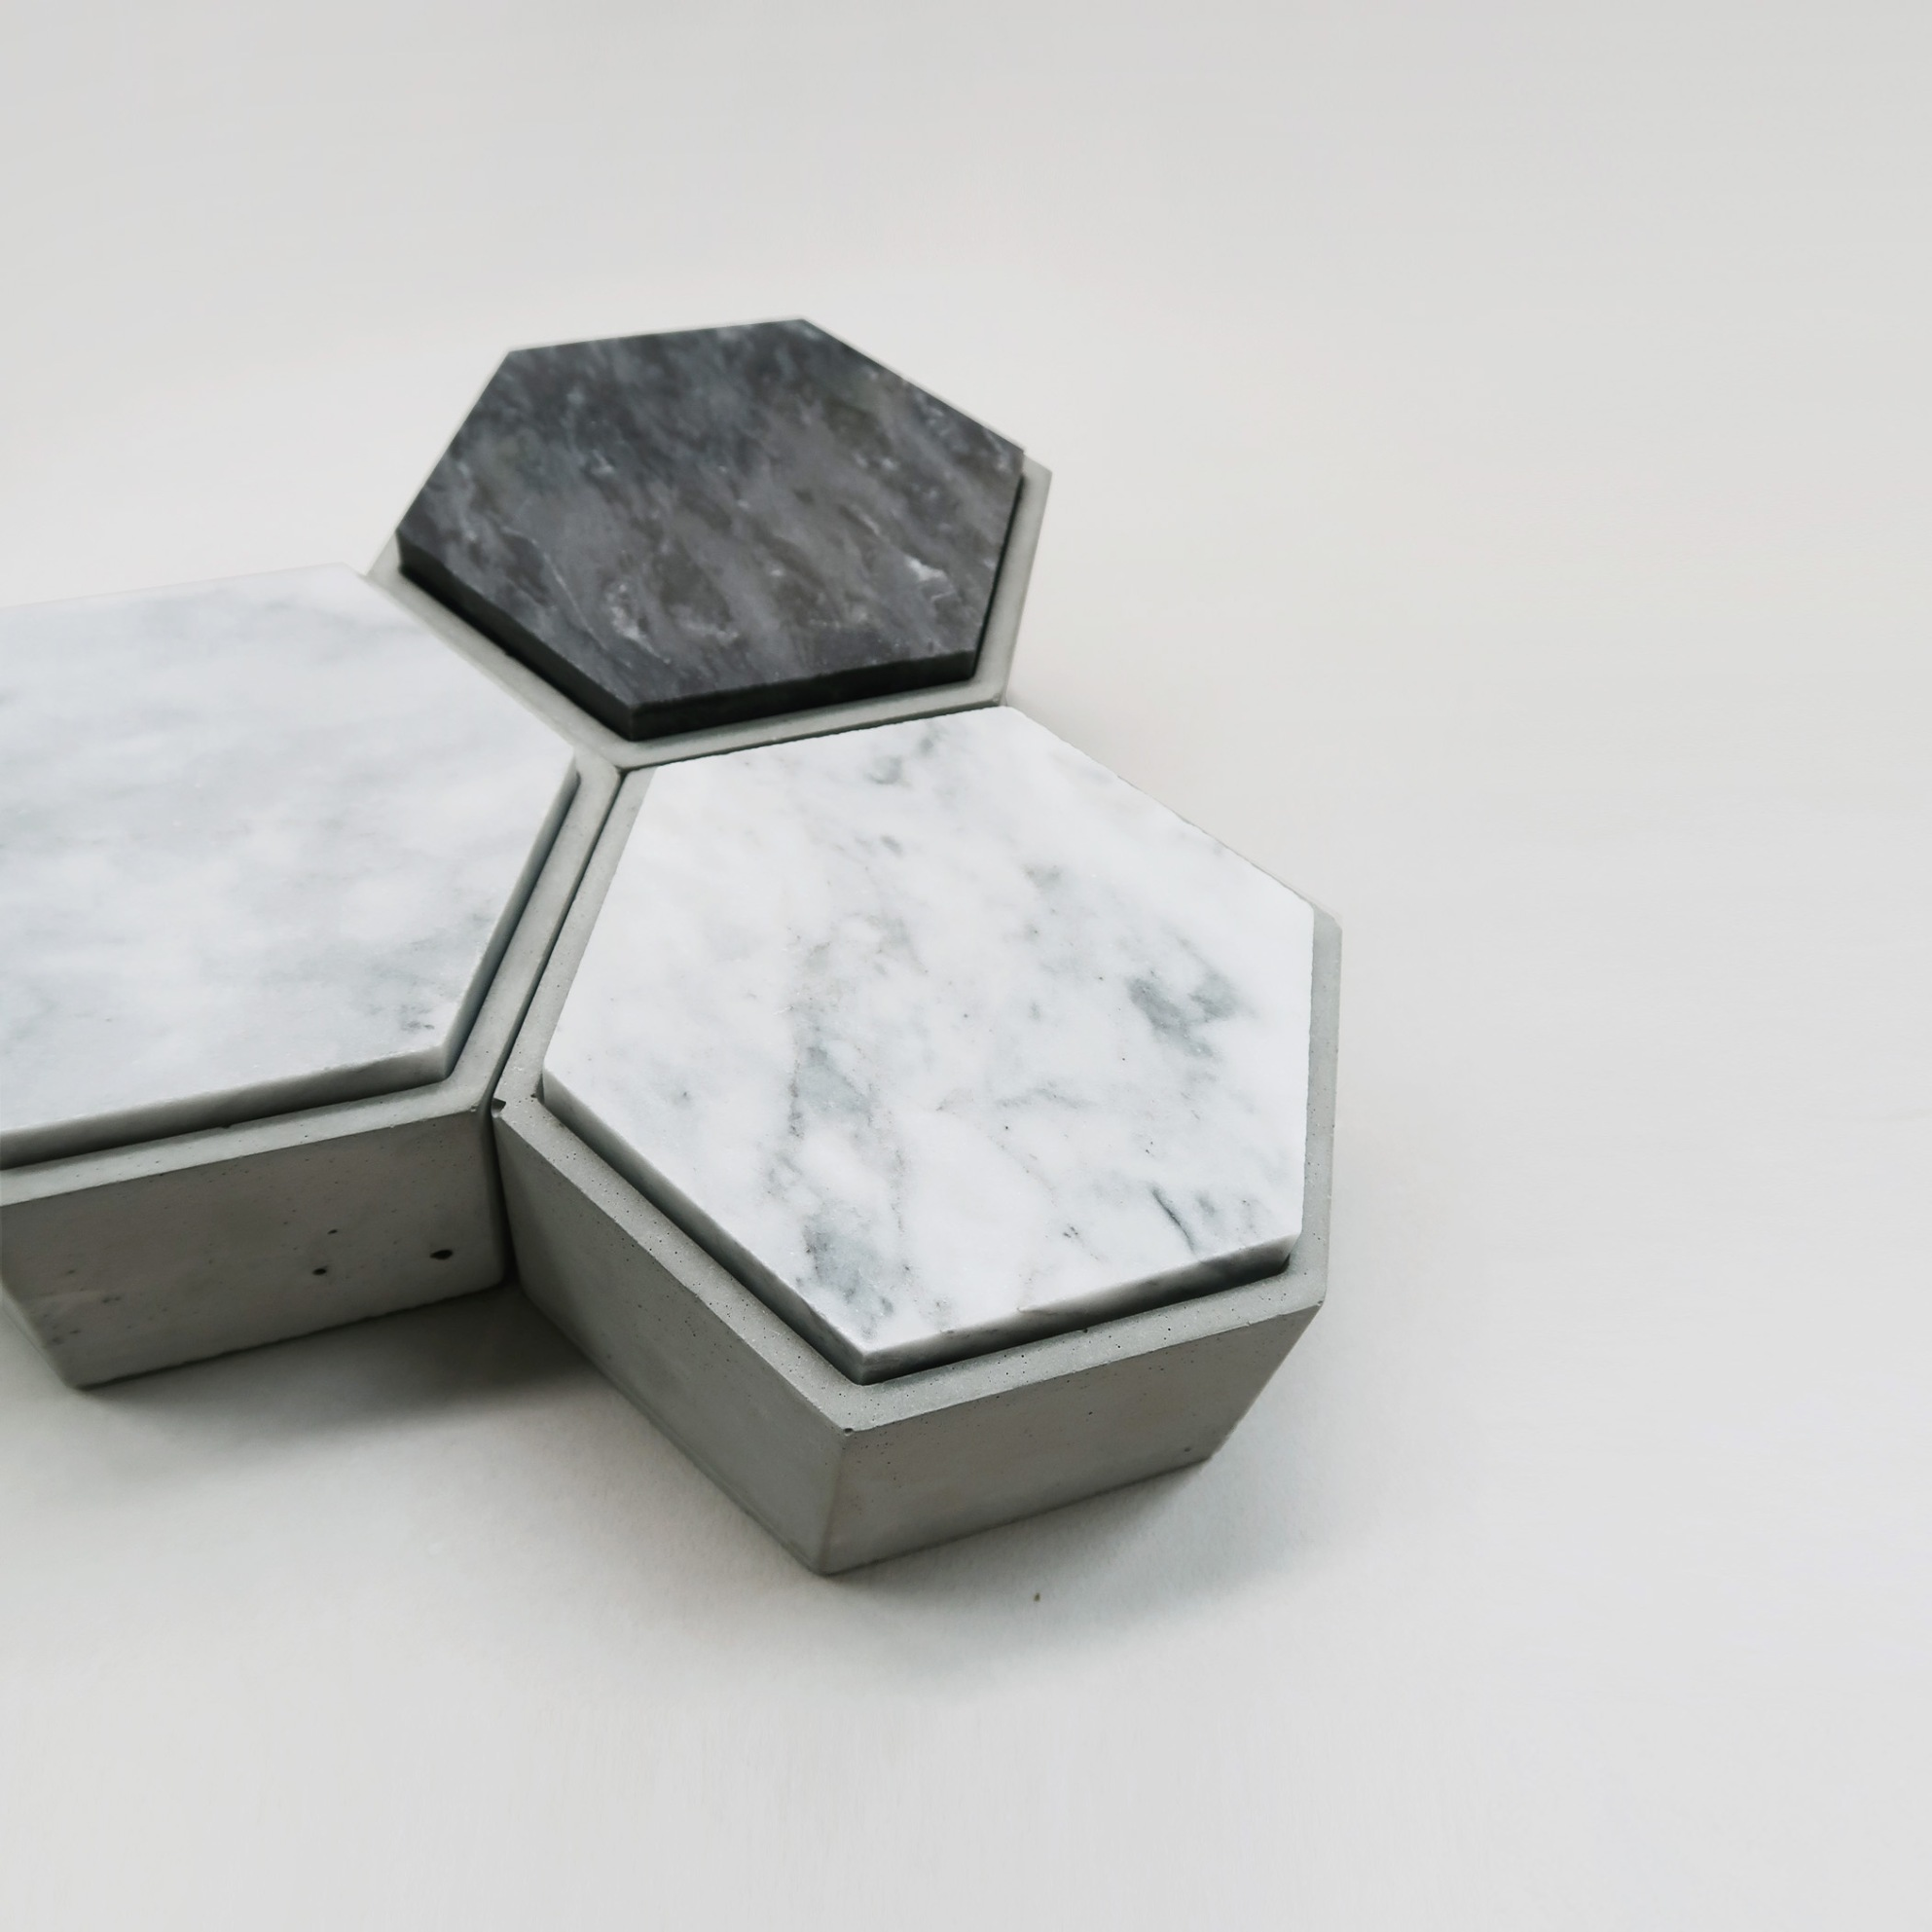 THE ROCK 雲岩六角大理石蓋水泥家飾・擺飾・禮物